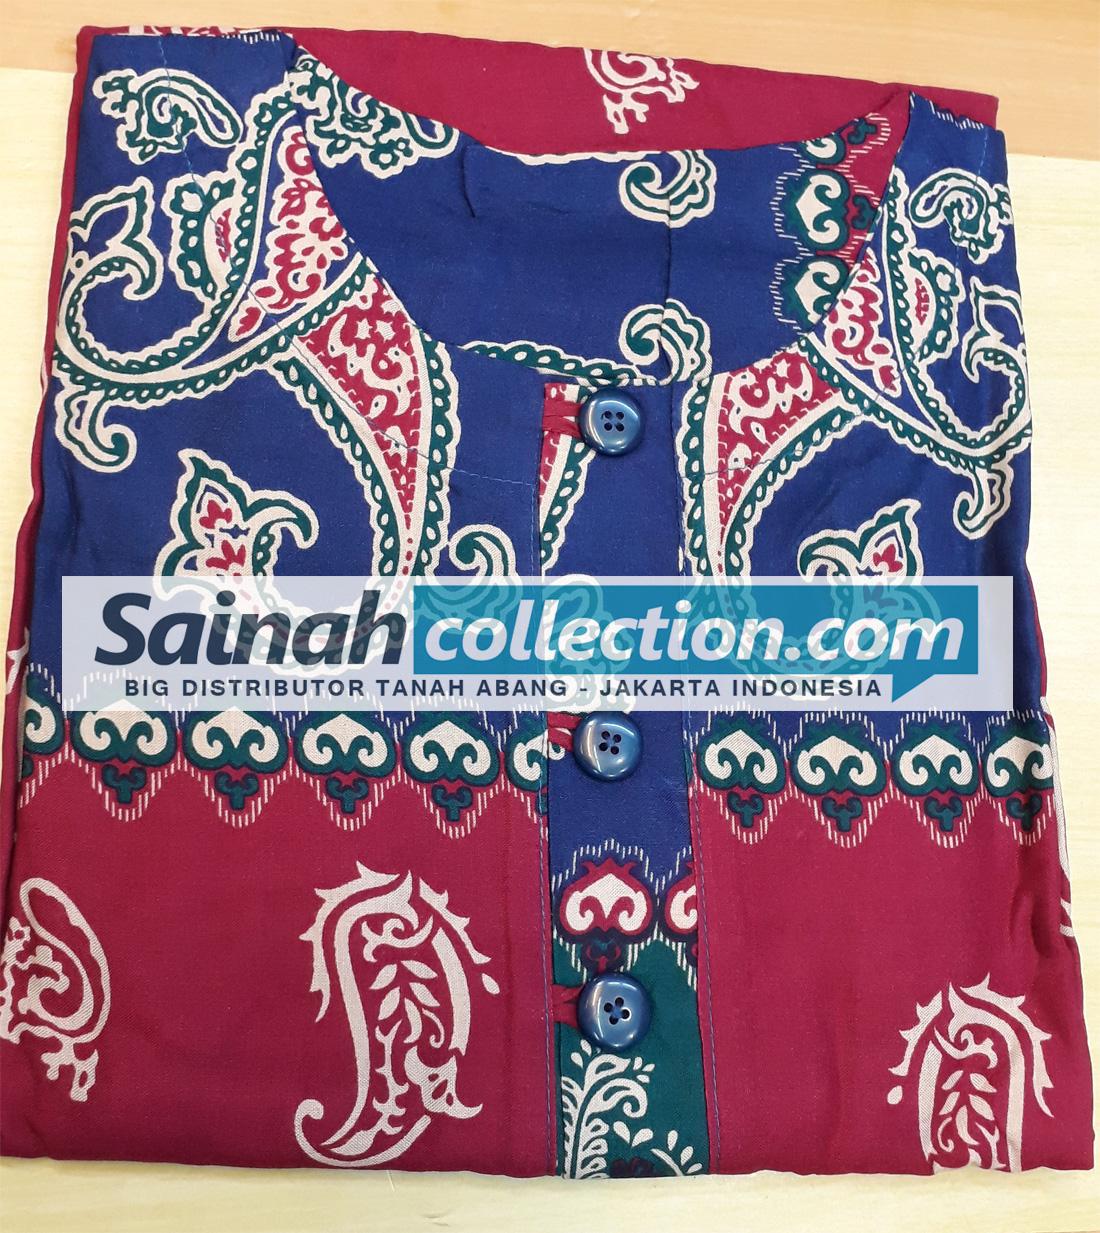 Grosir Hem Batik Murah: Distributor Grosir Baju Murah